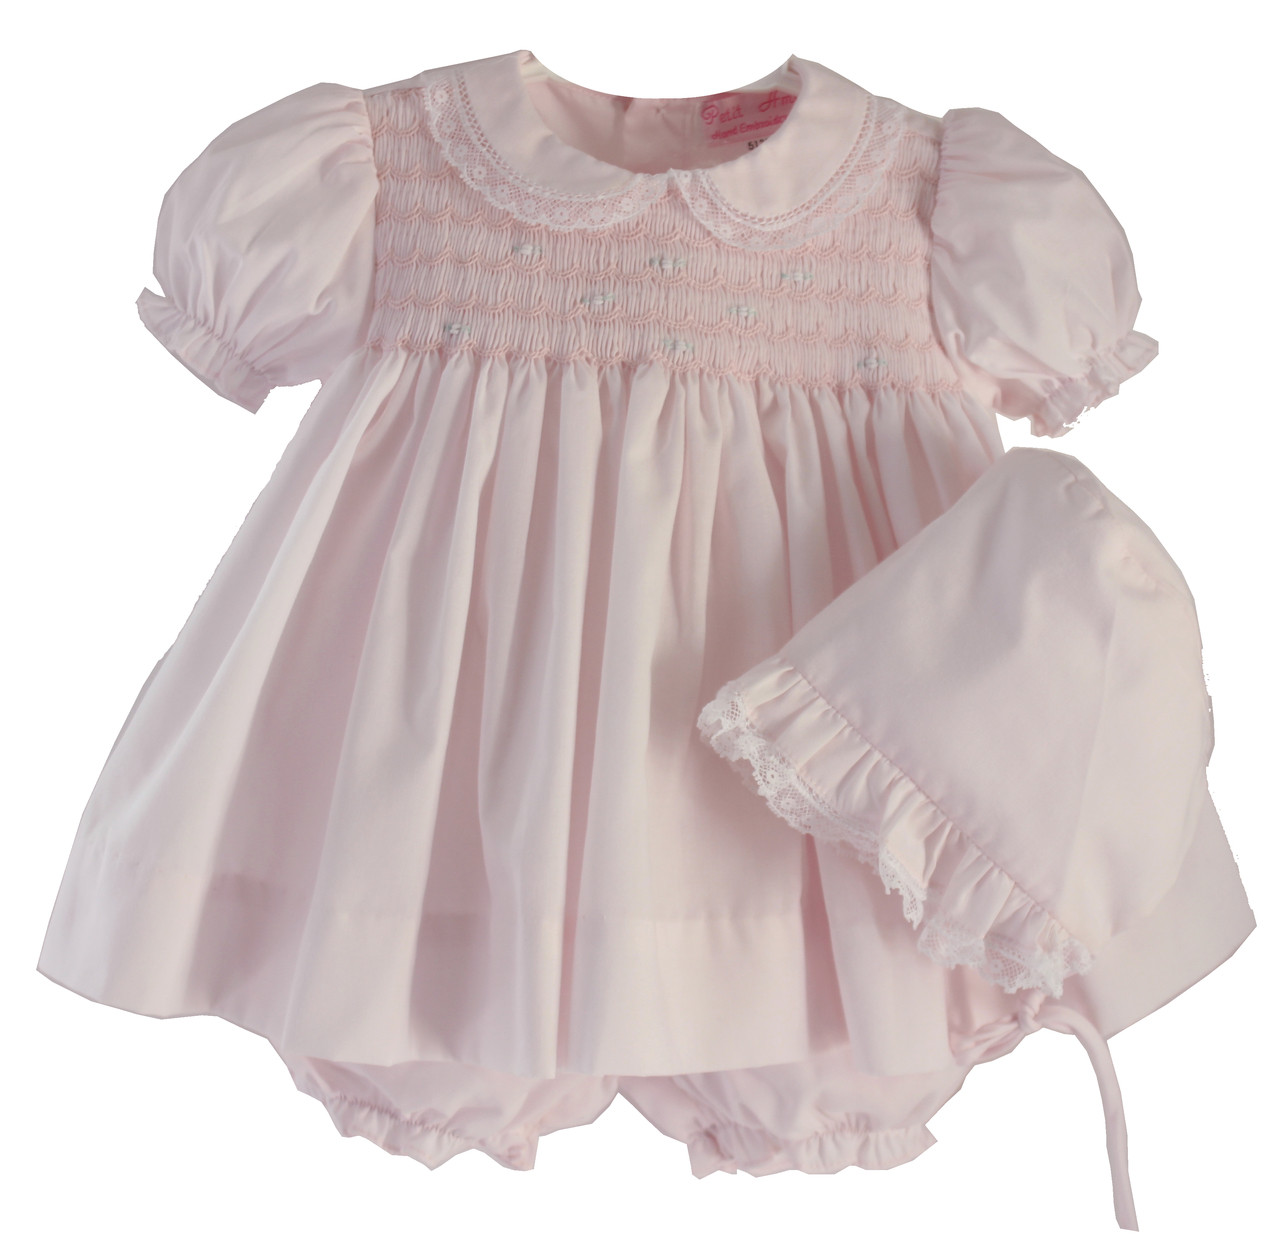 9d436a505 Newborn Girls Pink Smocked Dress & Bonnet - Petit Ami - Hiccups ...